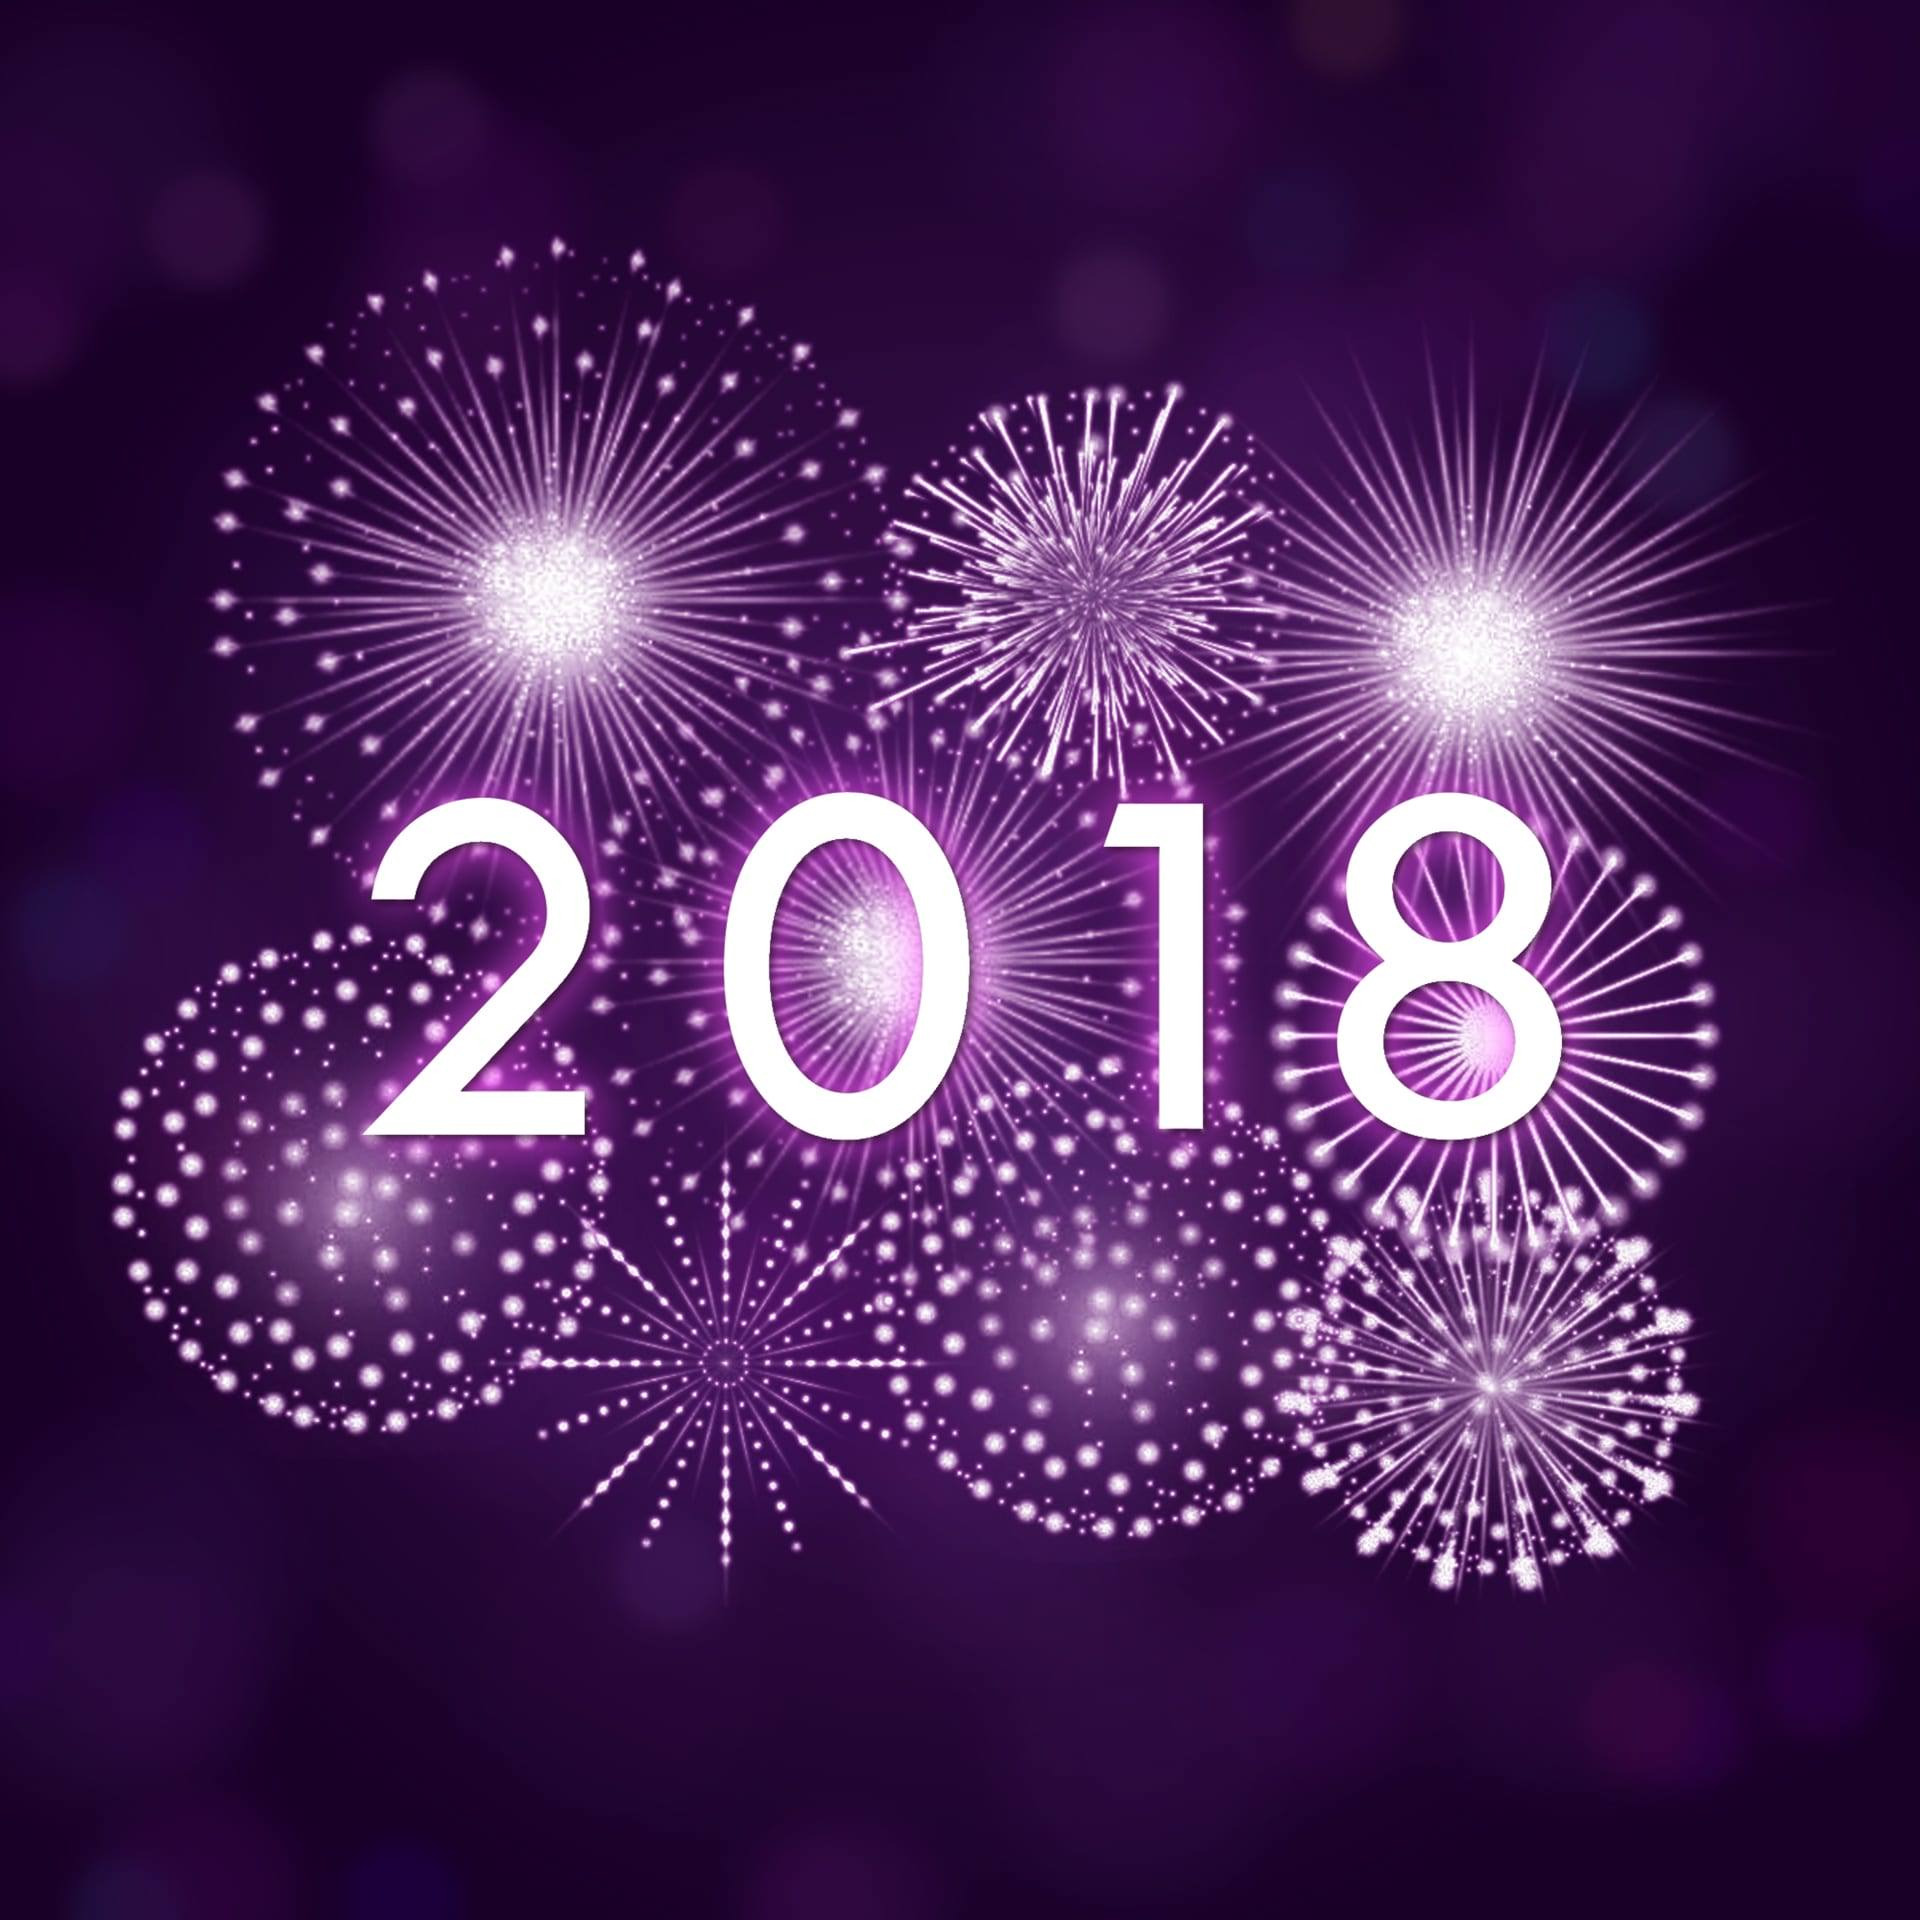 buon 2018 da francesco umberto iodice